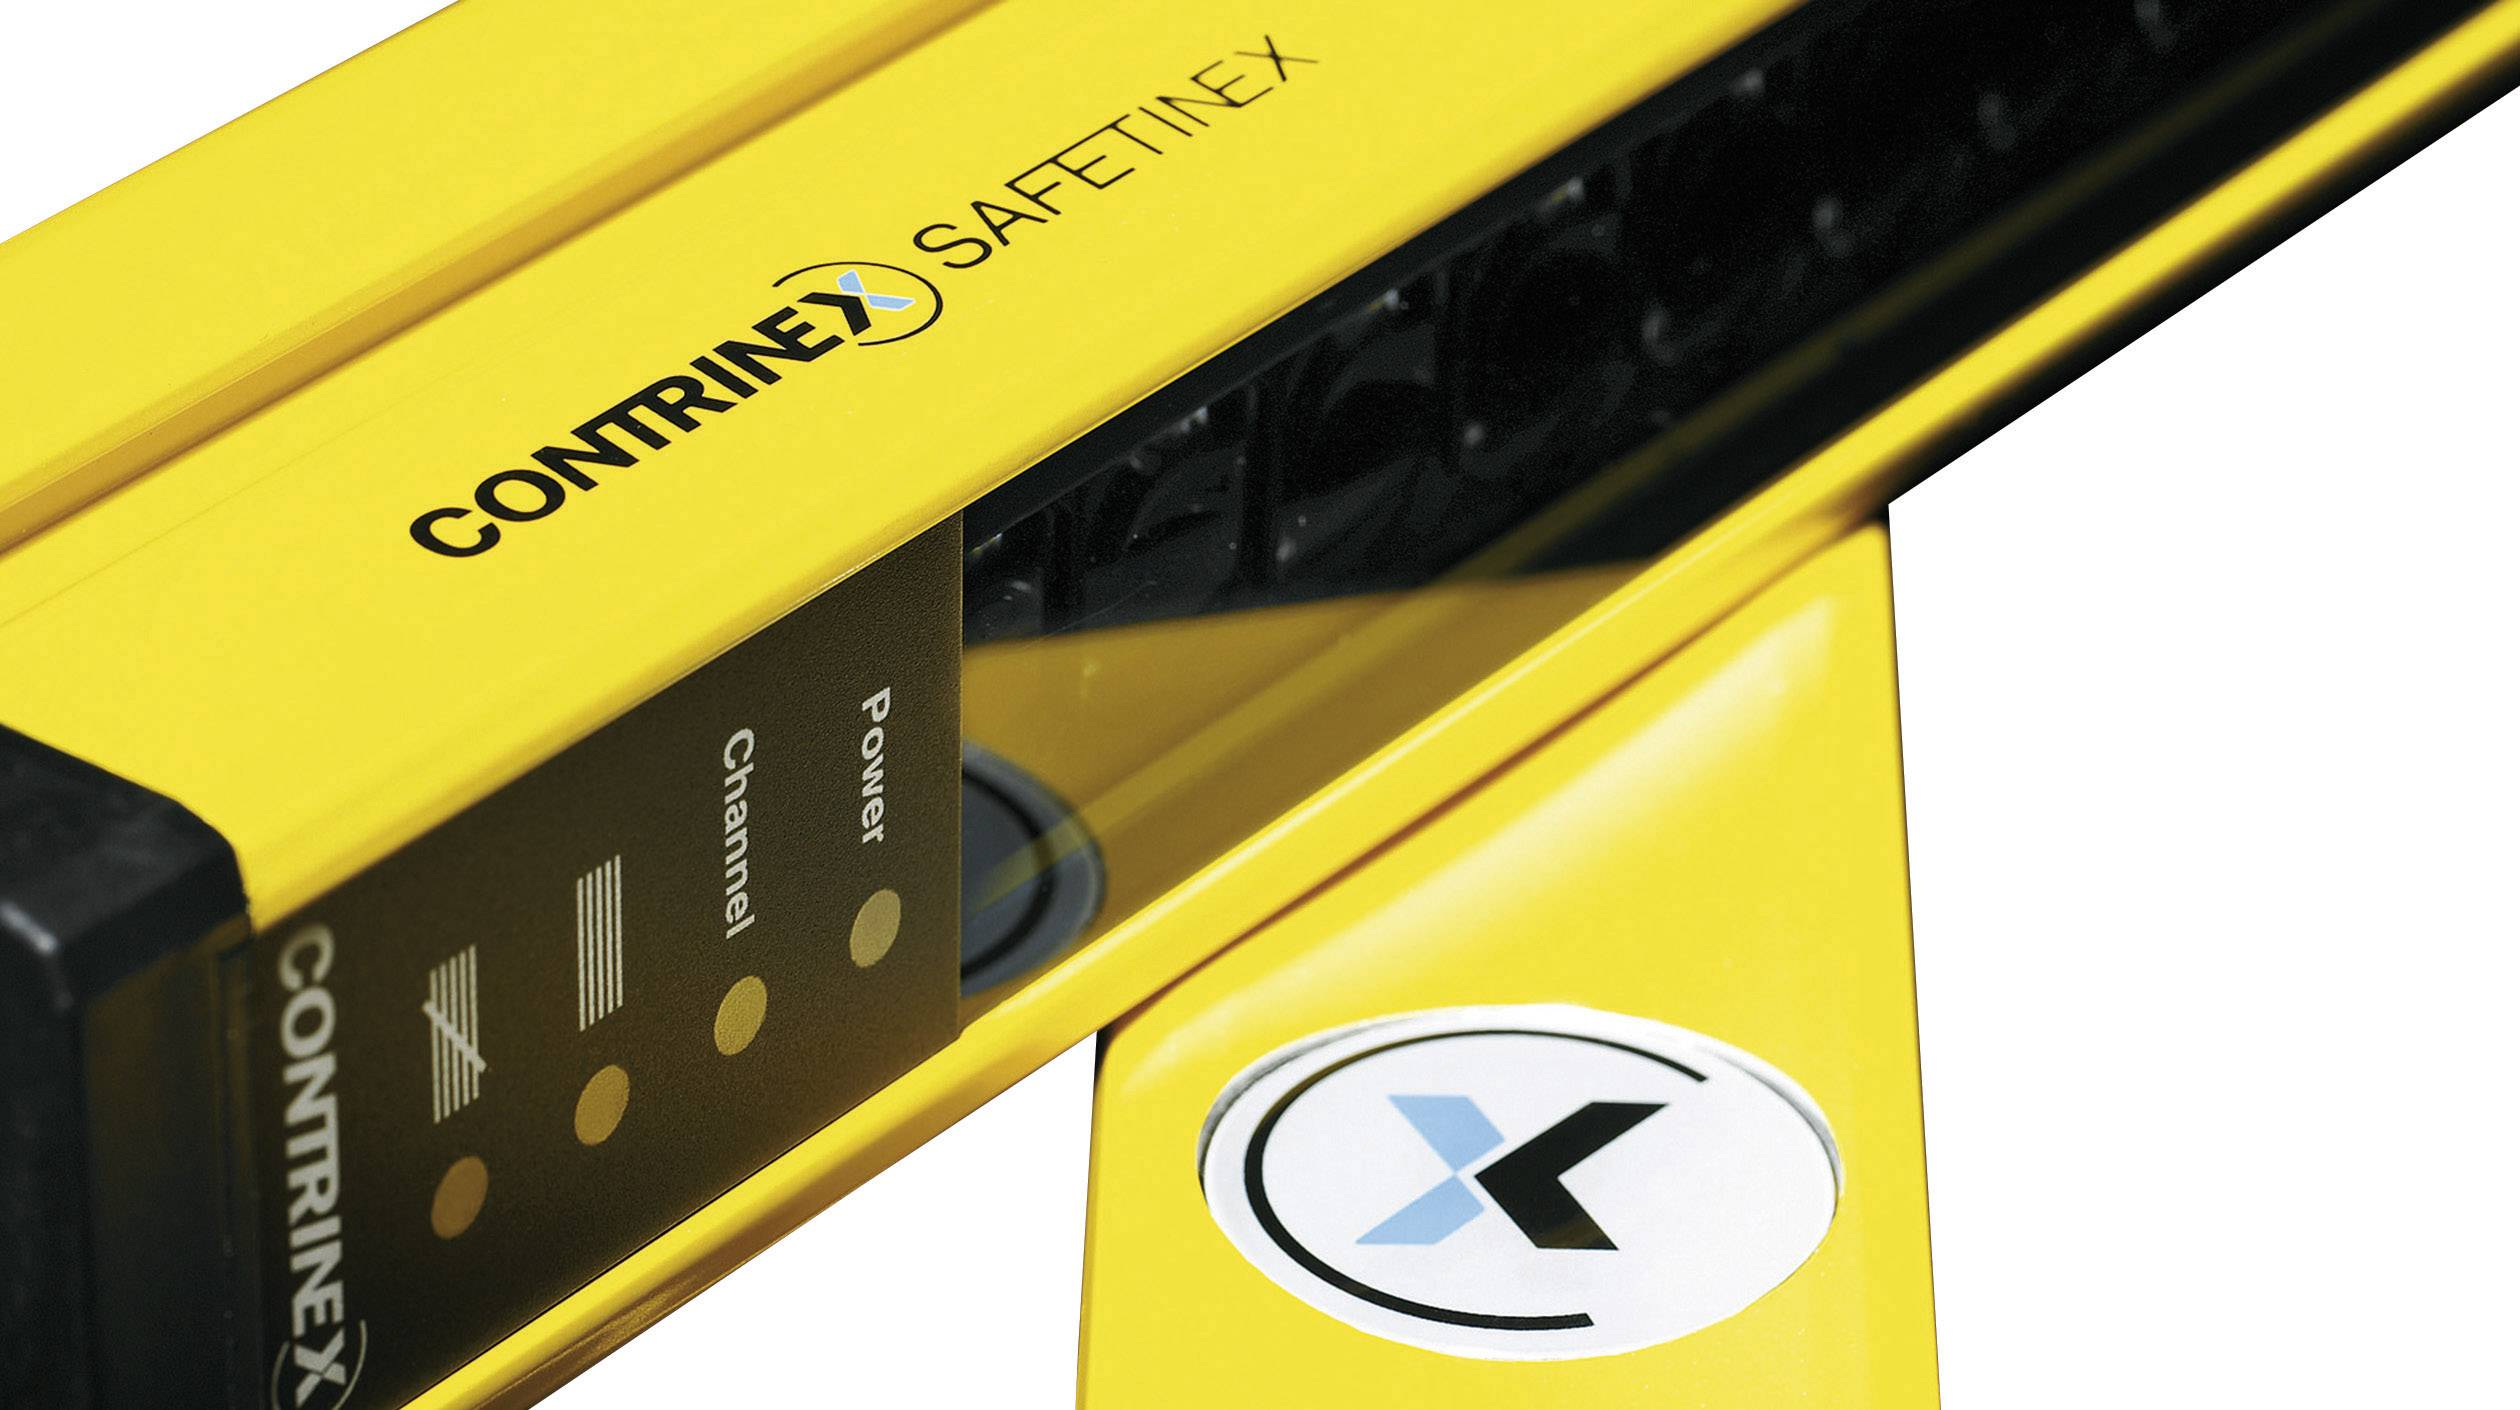 Contrinex YBB-14R4-0500-G012 630 000 109